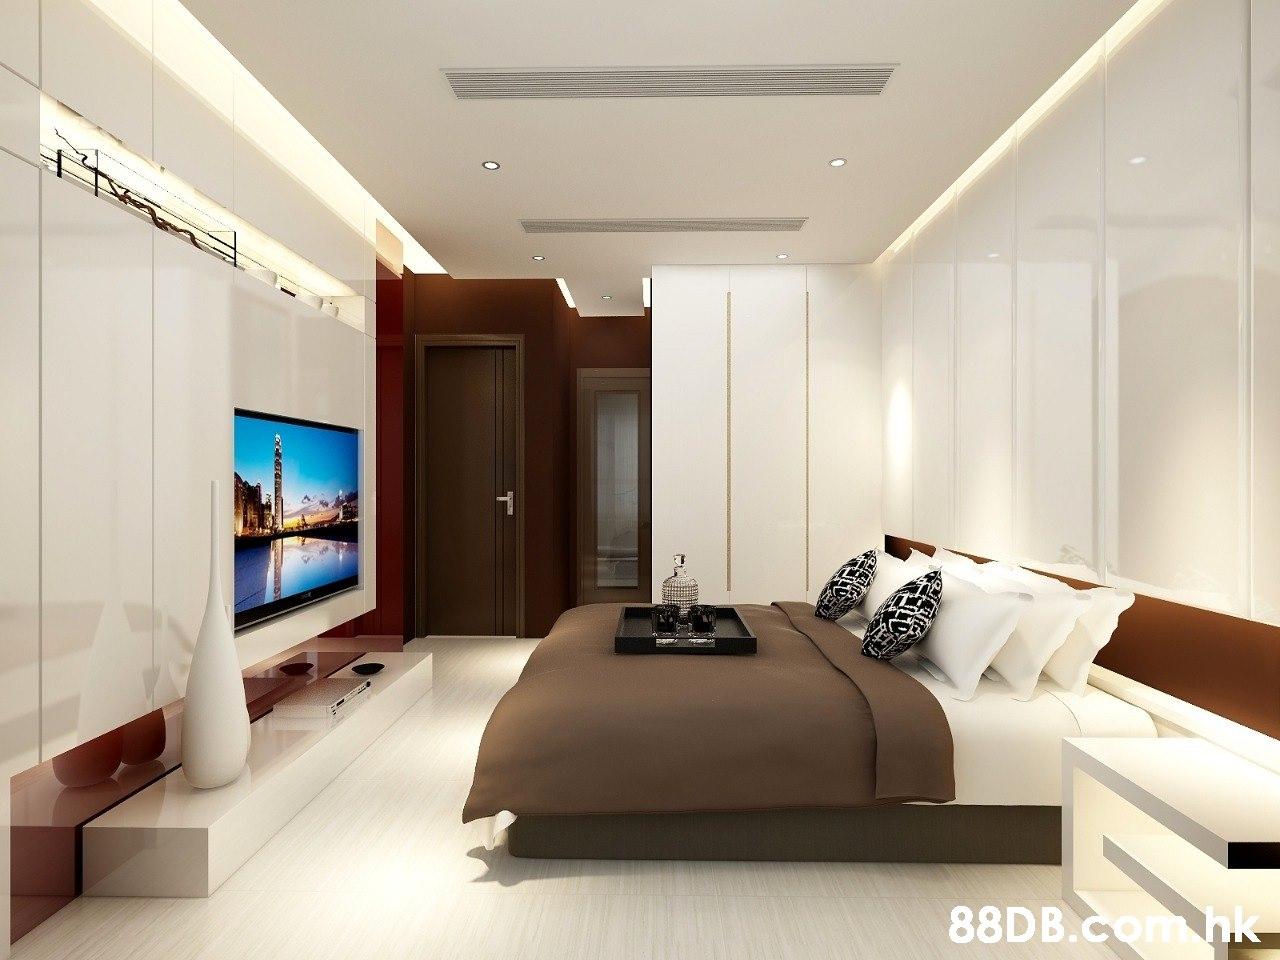 hk  Interior design,Room,Furniture,Bedroom,Ceiling